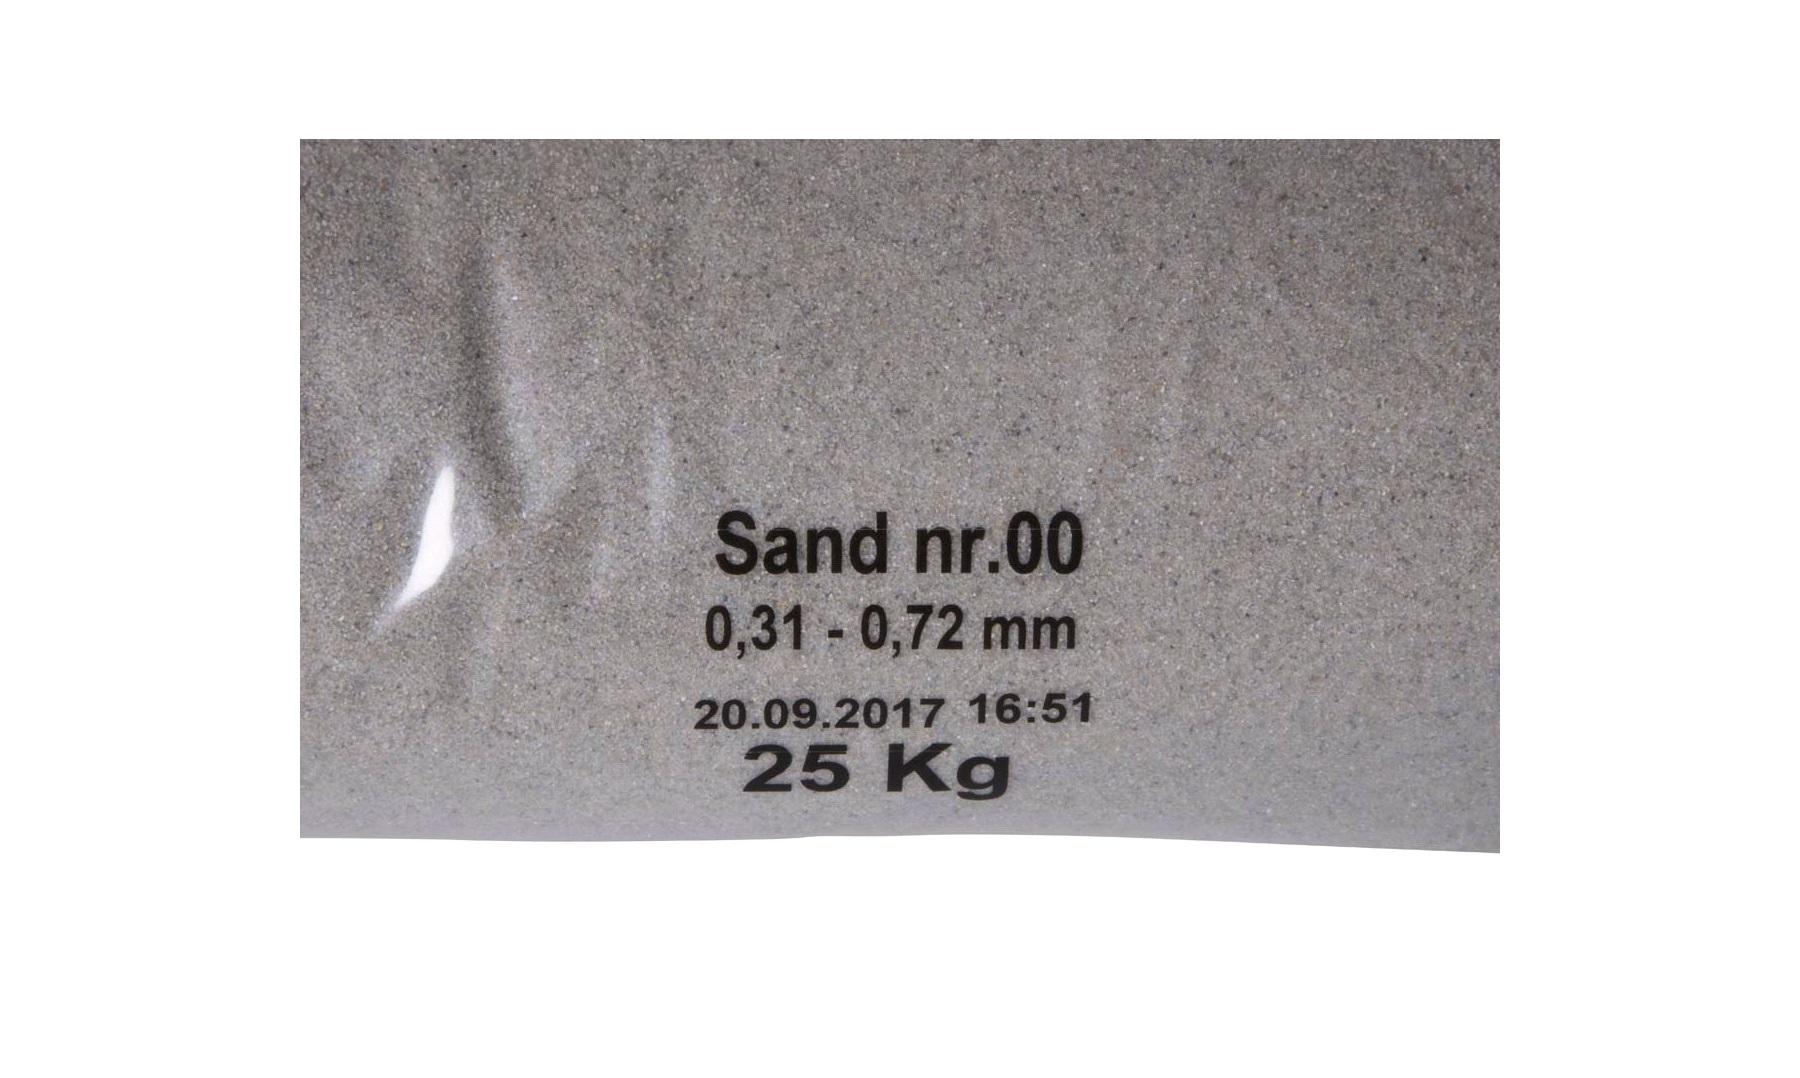 Kæmpestor Sandblæsningssand nr. 00 25kg. - Tilbehør - thansen.dk SH03